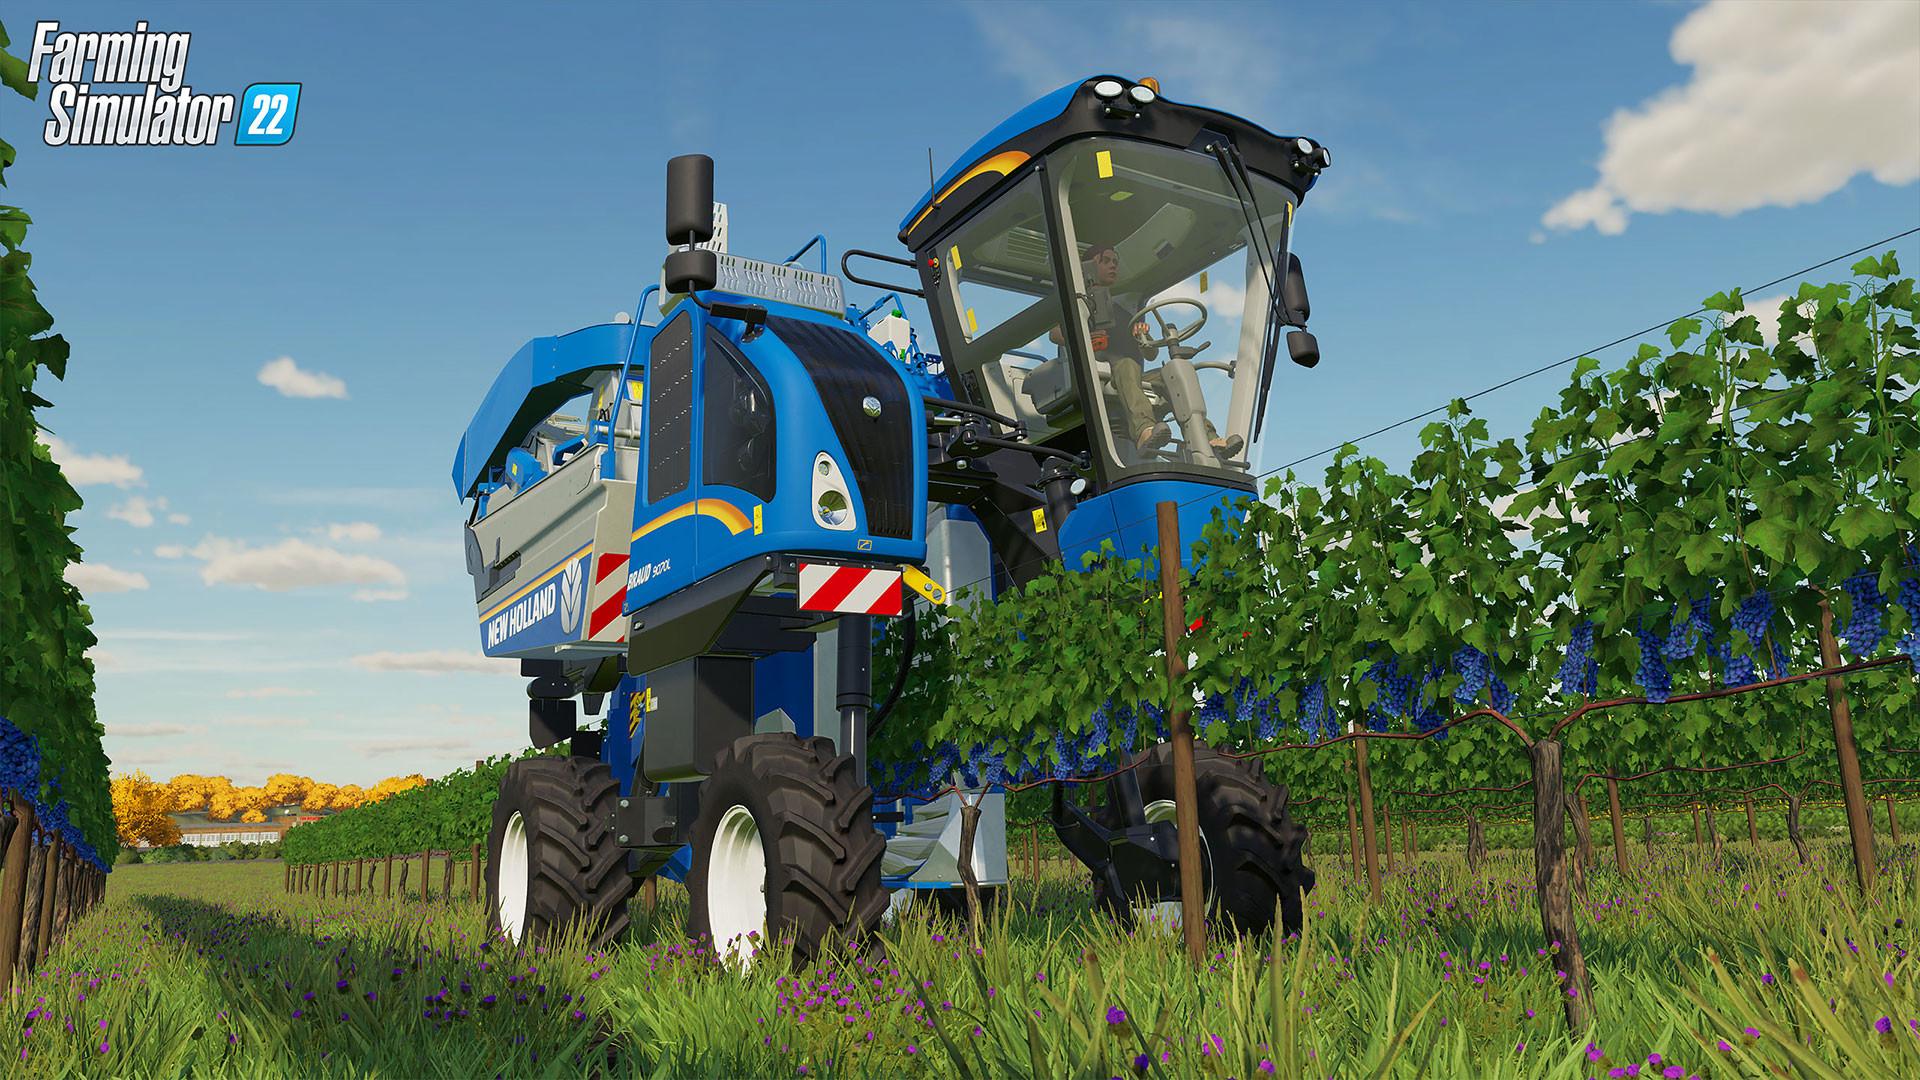 FarmCon 7月22日开始 将展示《模拟农场22》游戏玩法演示